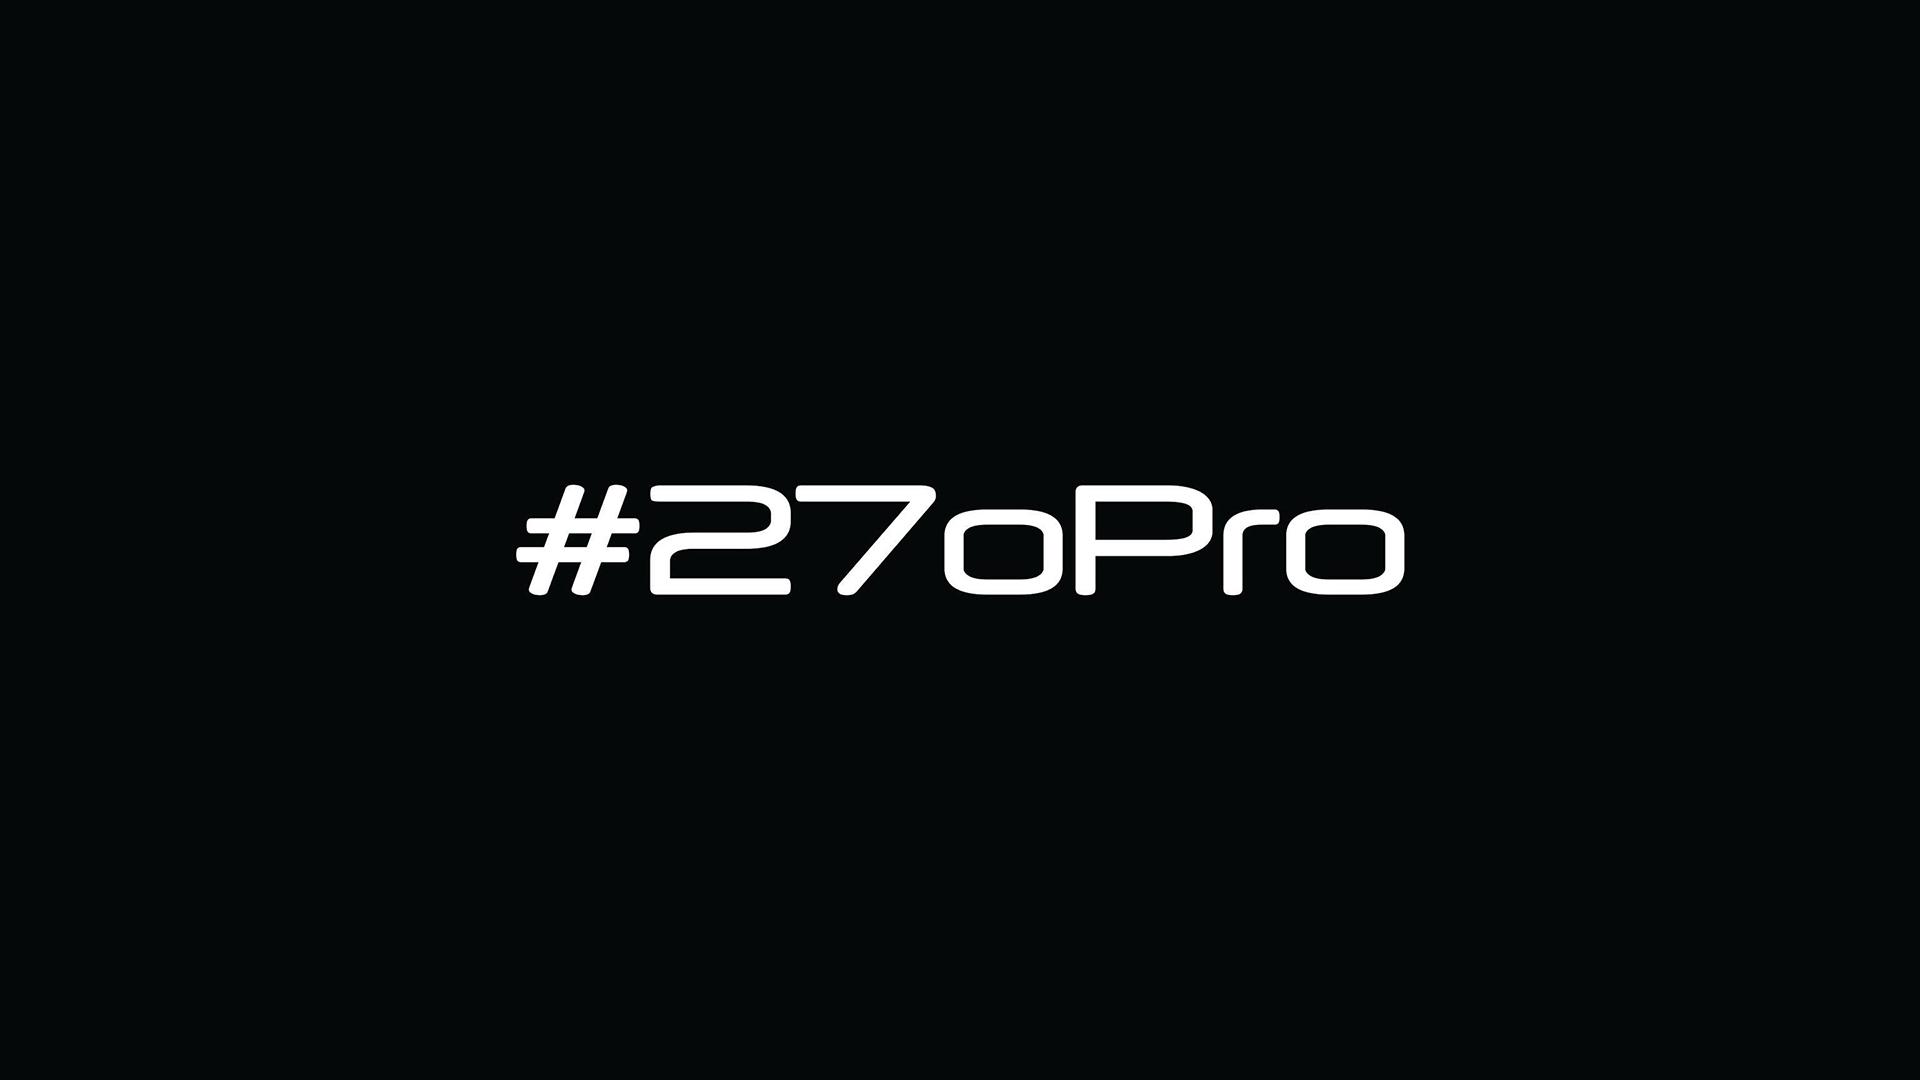 #270Pro BackPack